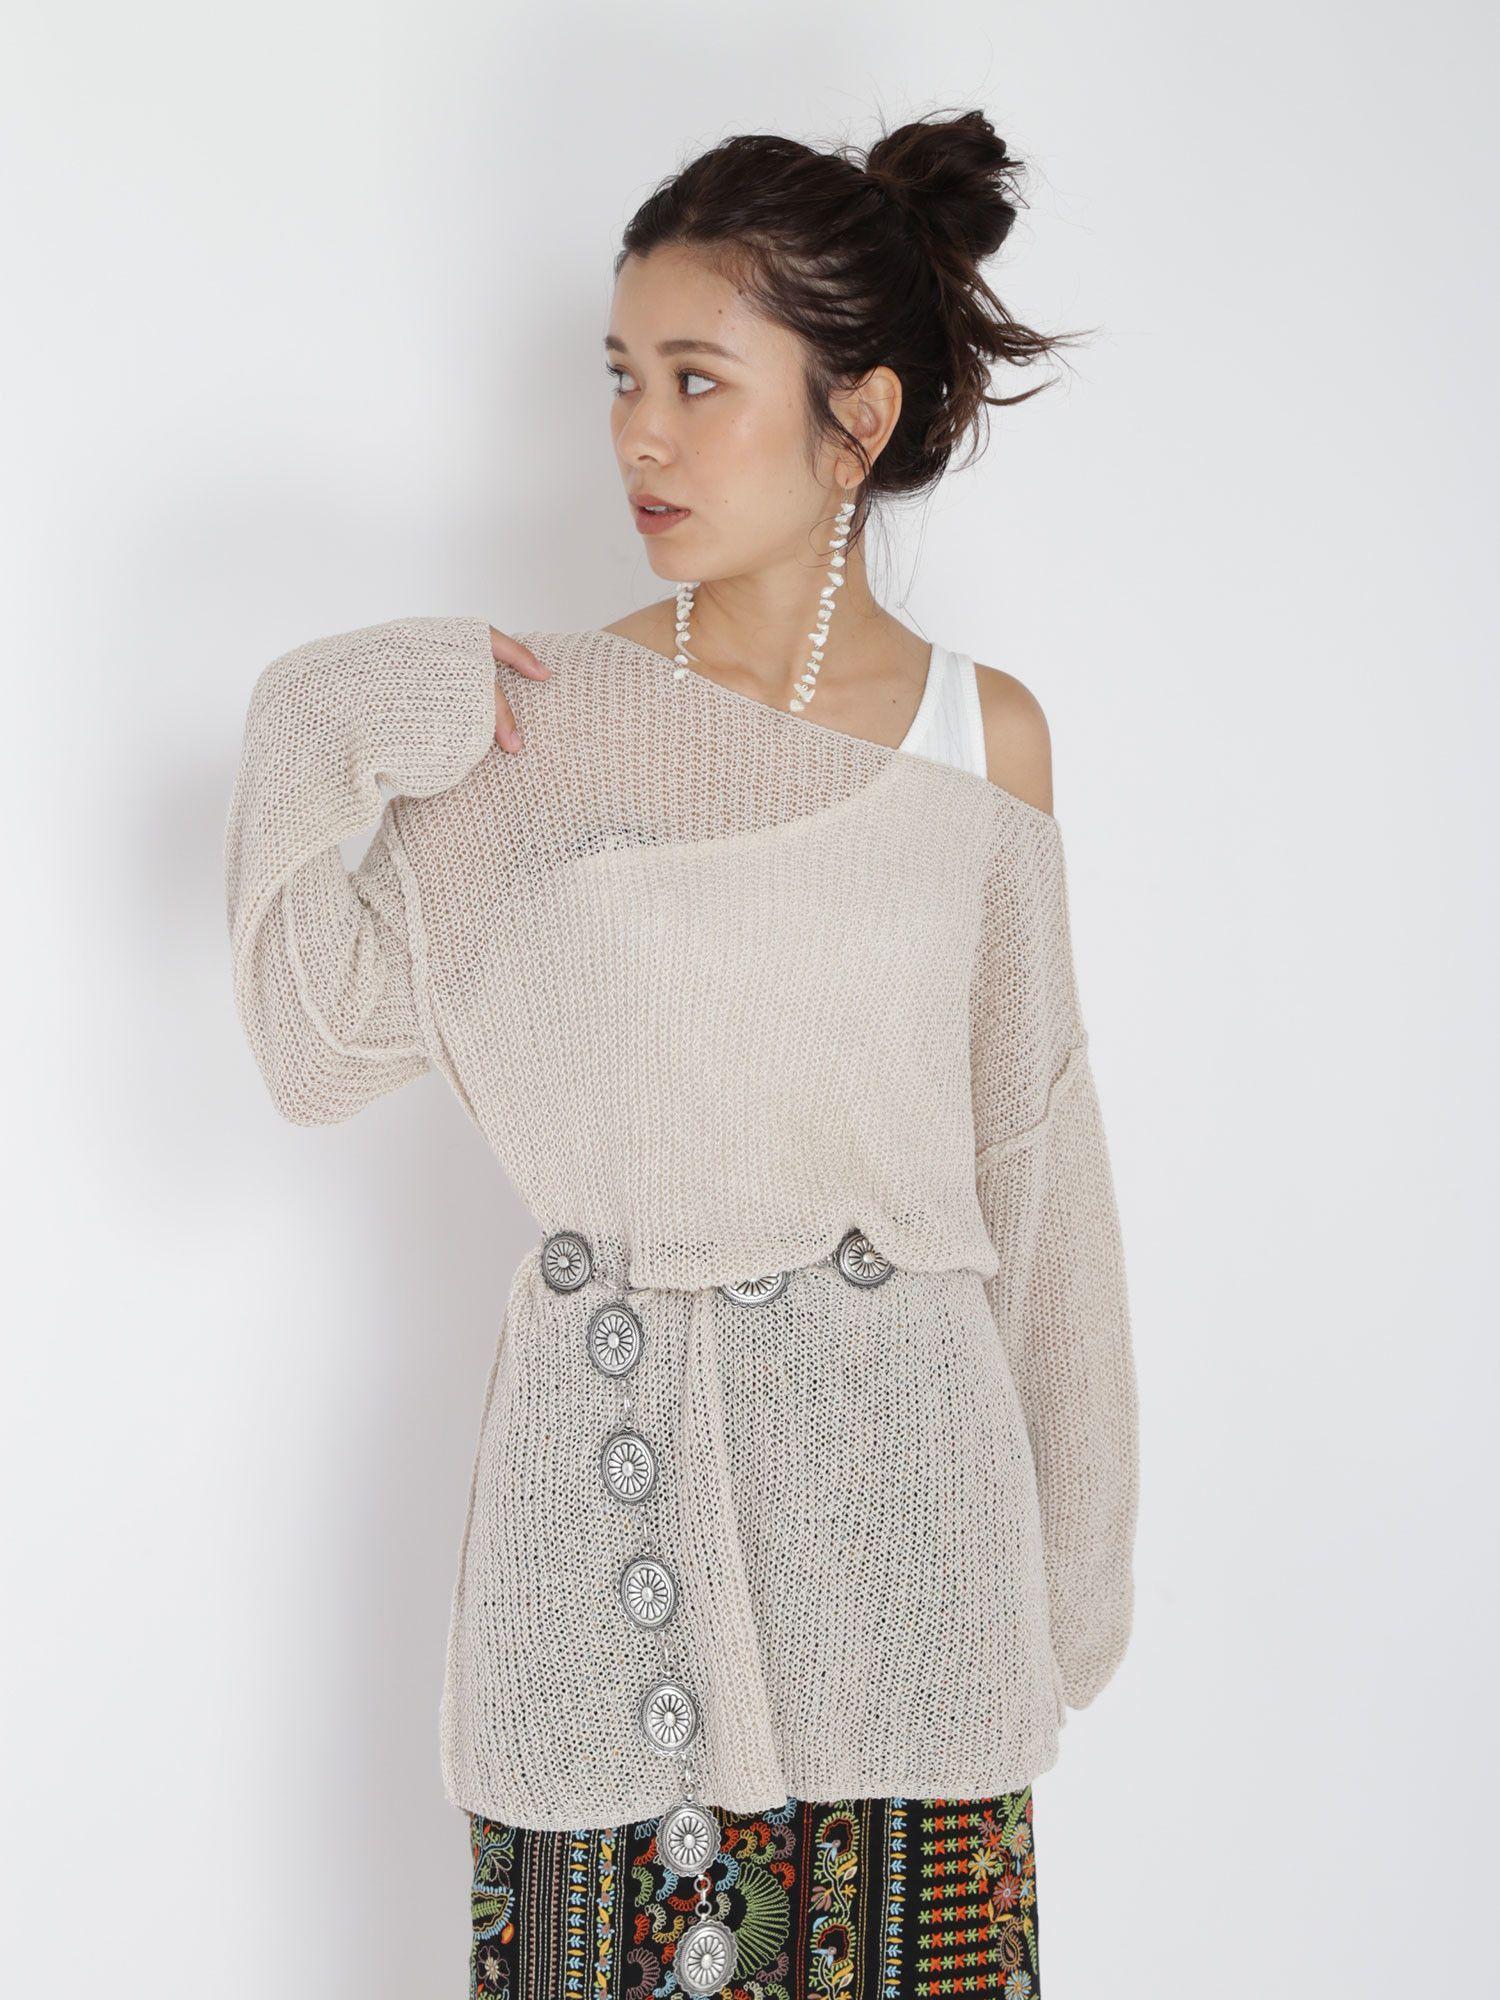 Linen blend loose knit